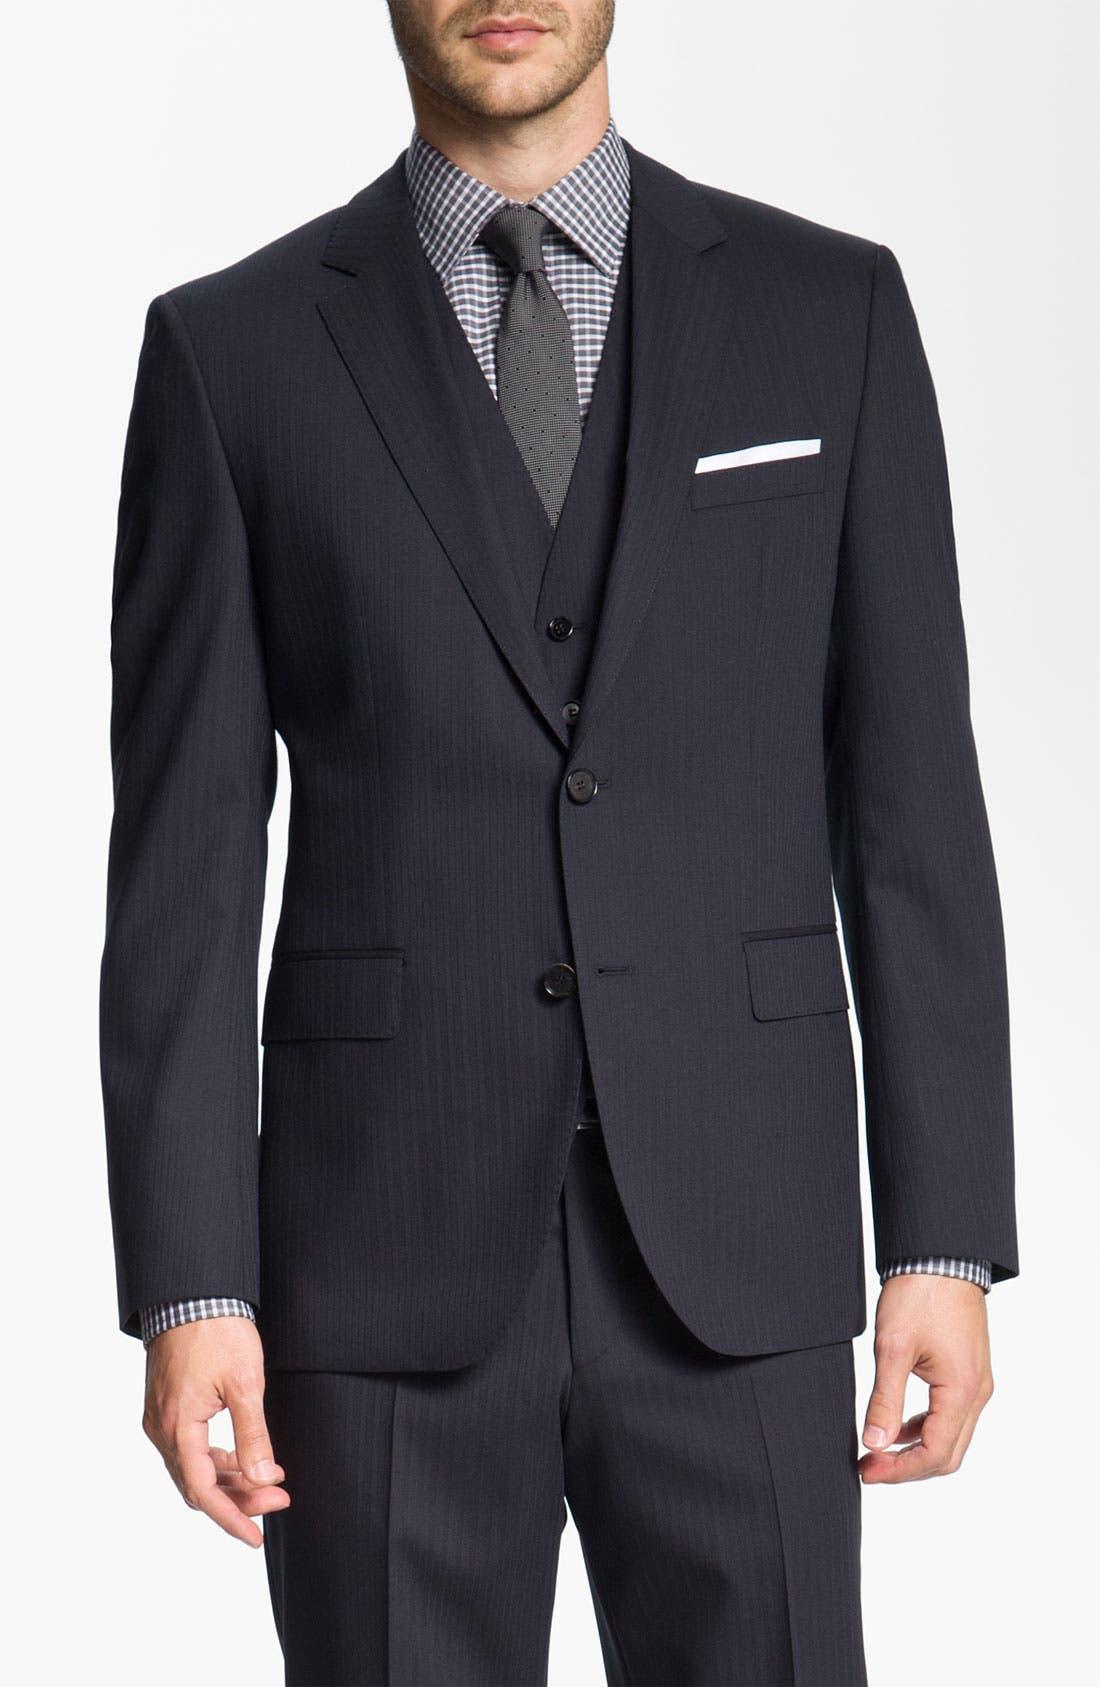 Alternate Image 1 Selected - BOSS Black 'James/Sharp' Trim Fit Three Piece Suit